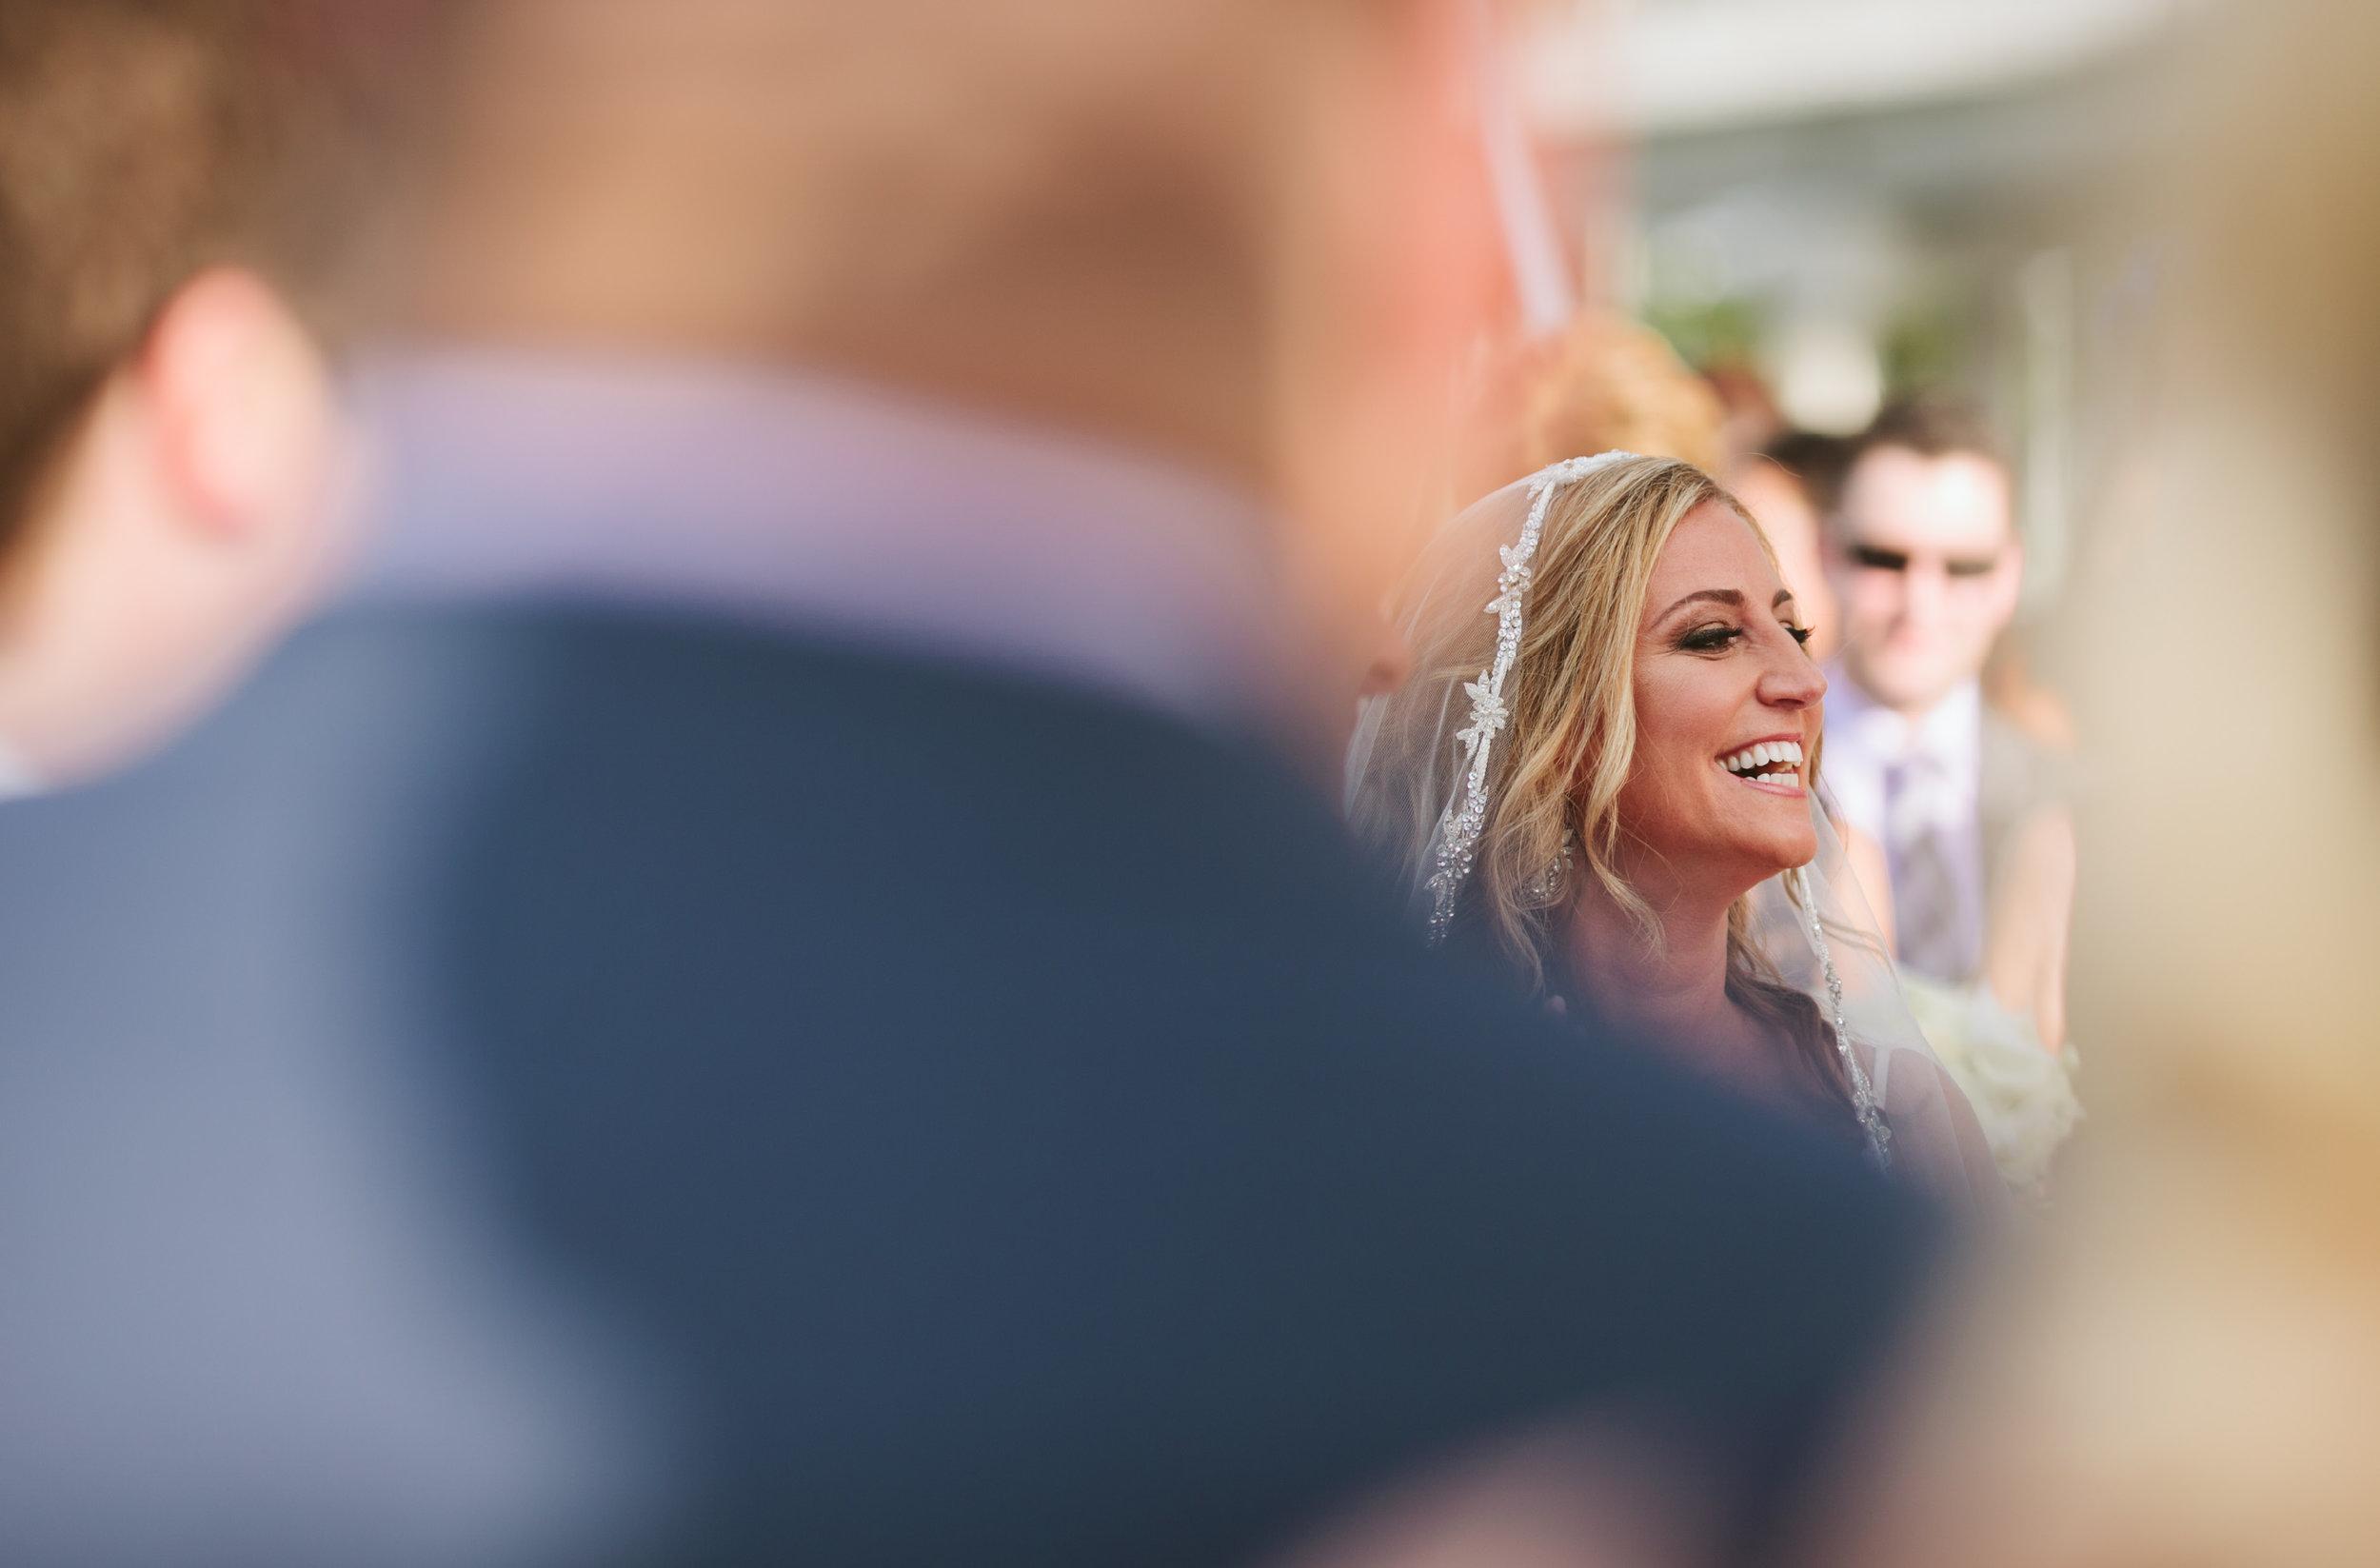 Kim + John's Wedding at the Waterstone Hotel in Boca Raton47.jpg